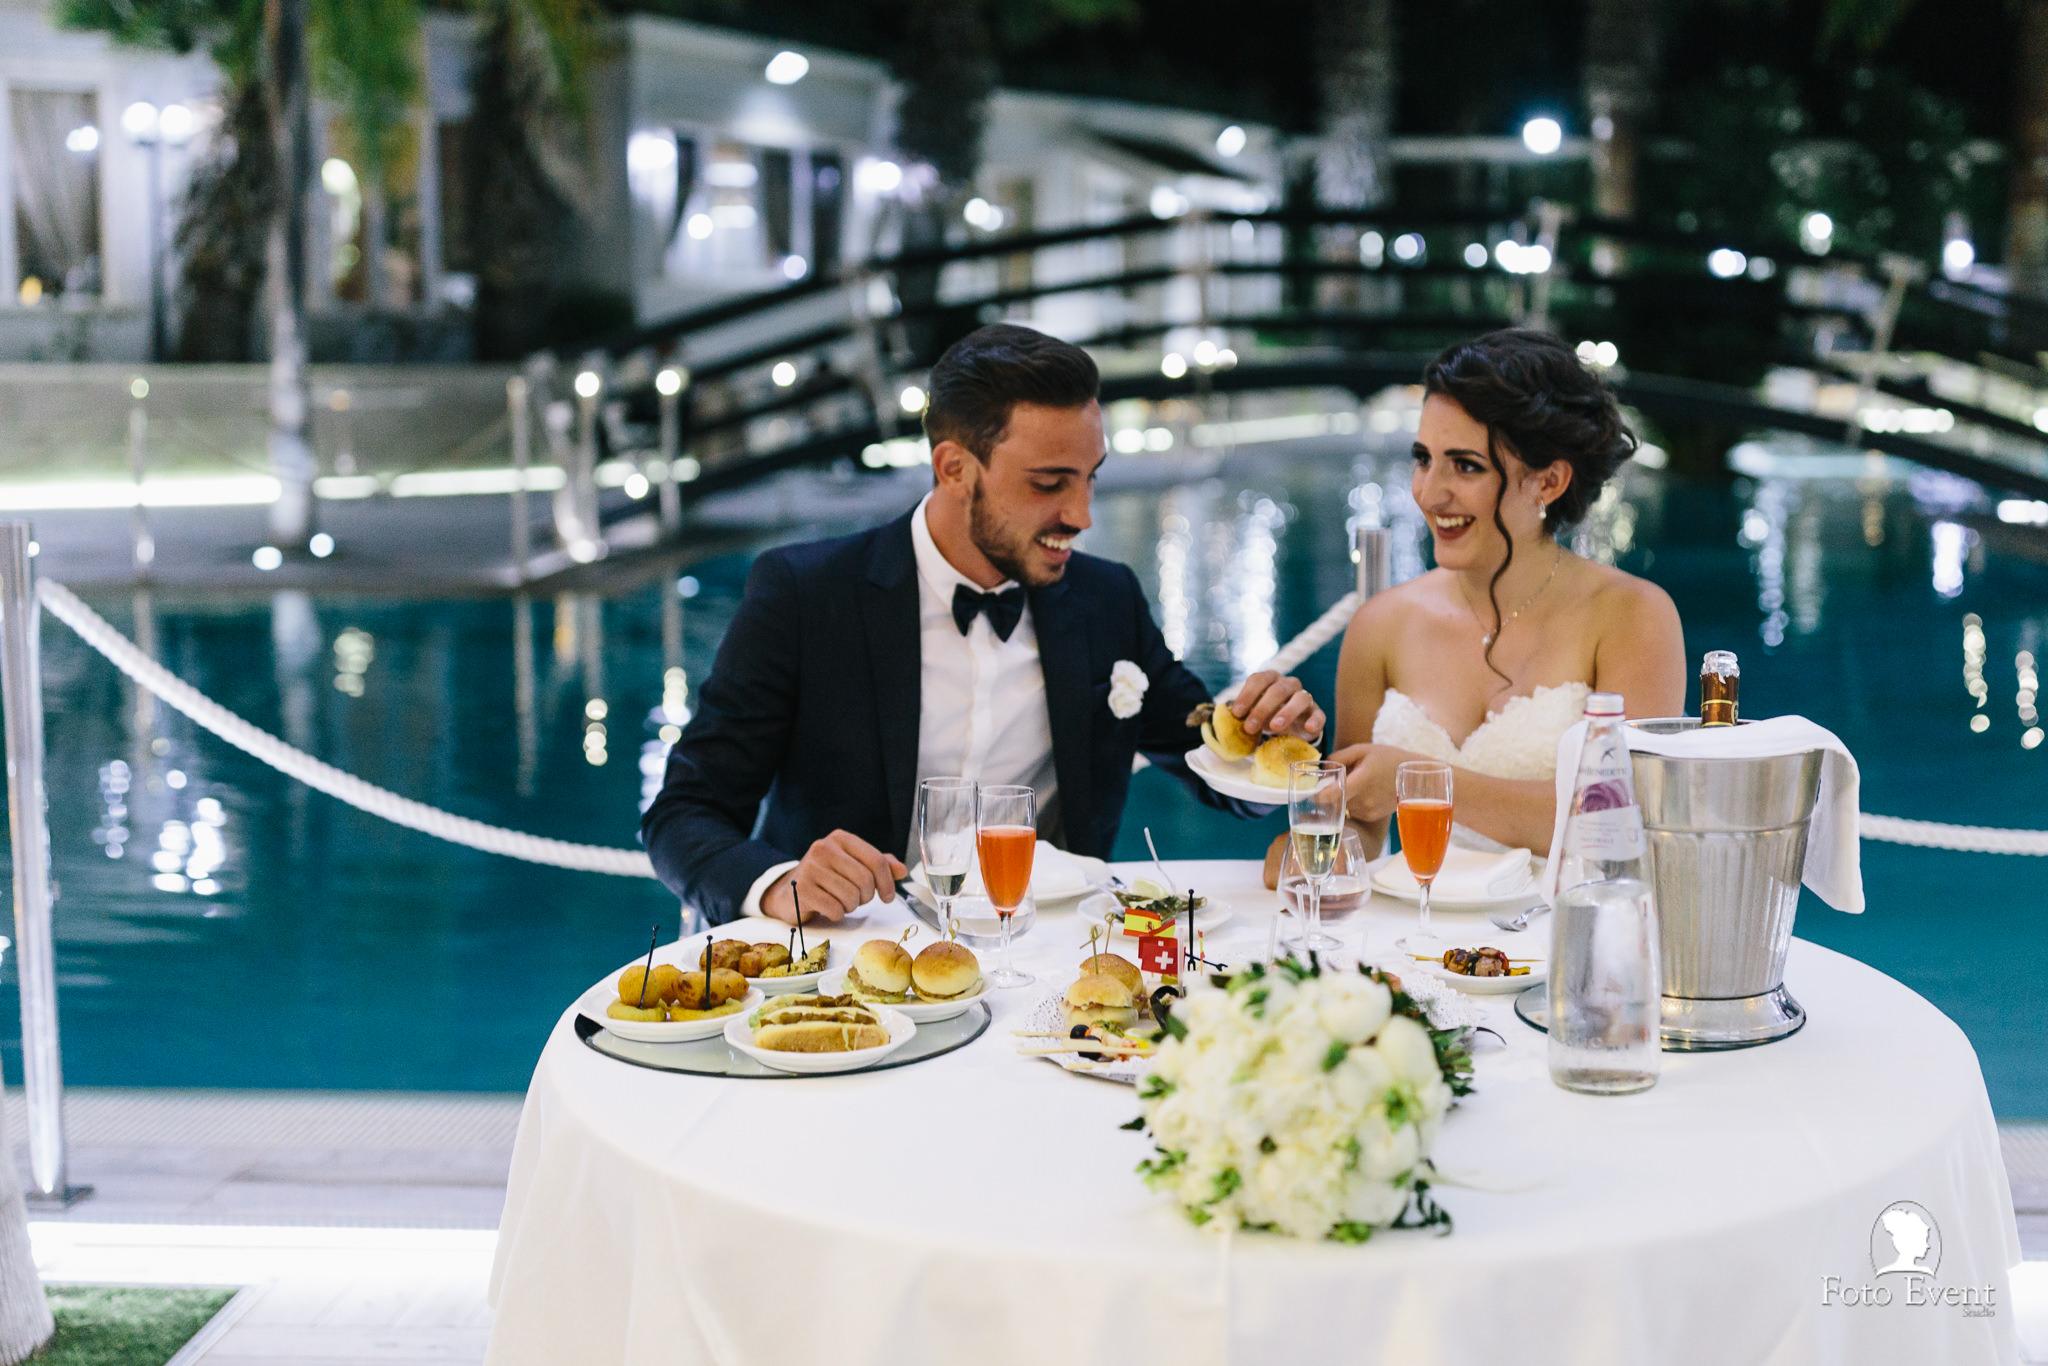 048-2019-08-31-Matrimonio-Serena-e-Saverio-Tarantino-zoom-520